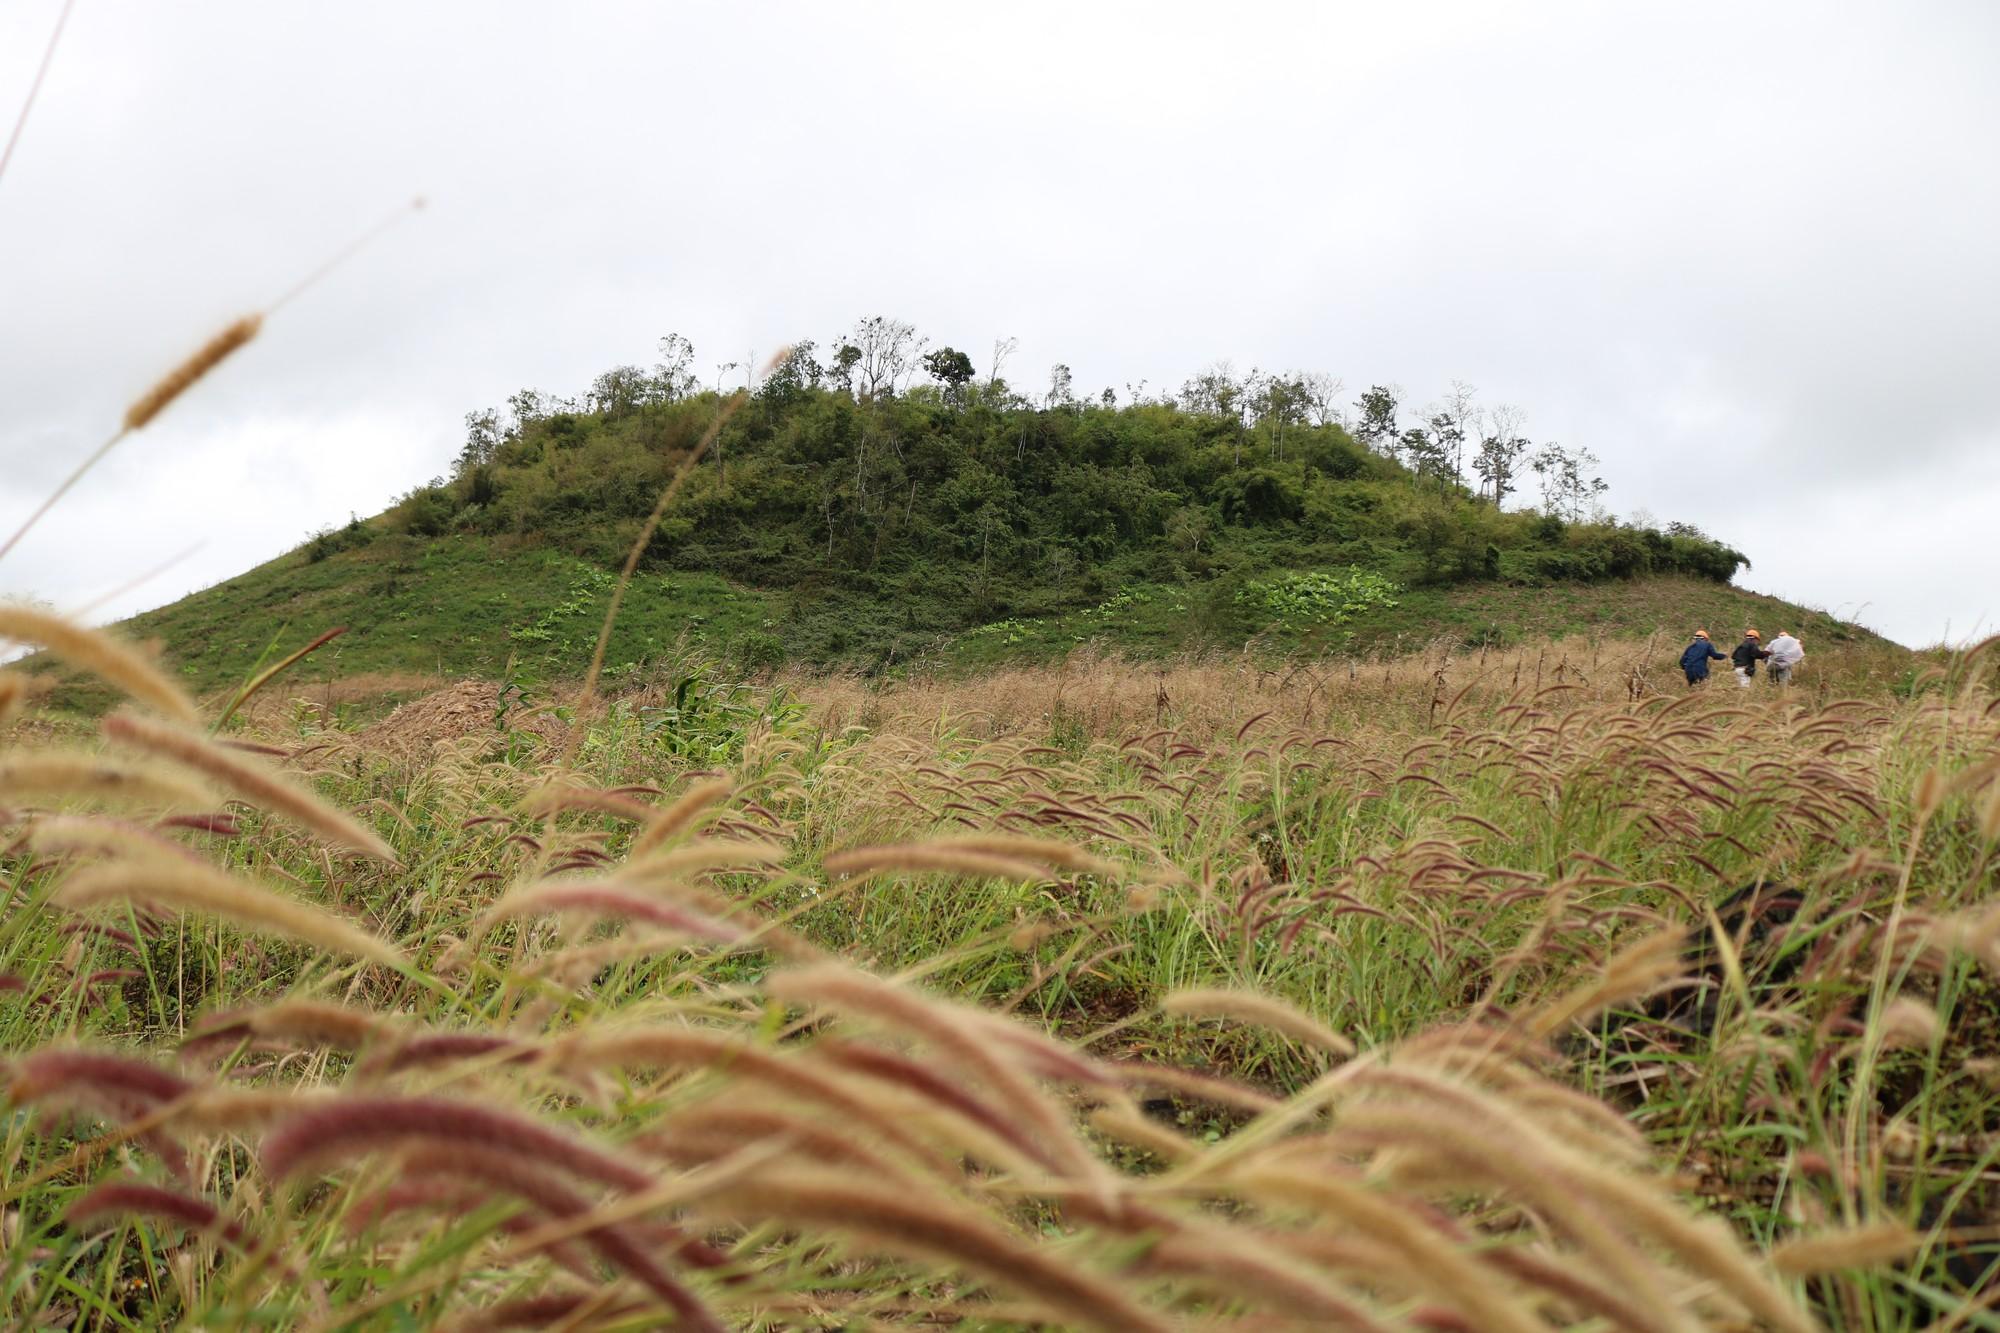 The Chu B'luk (Genesis) volcano in Dak Nong Province, Vietnam's Central Highlands. Photo: Tuoi Tre